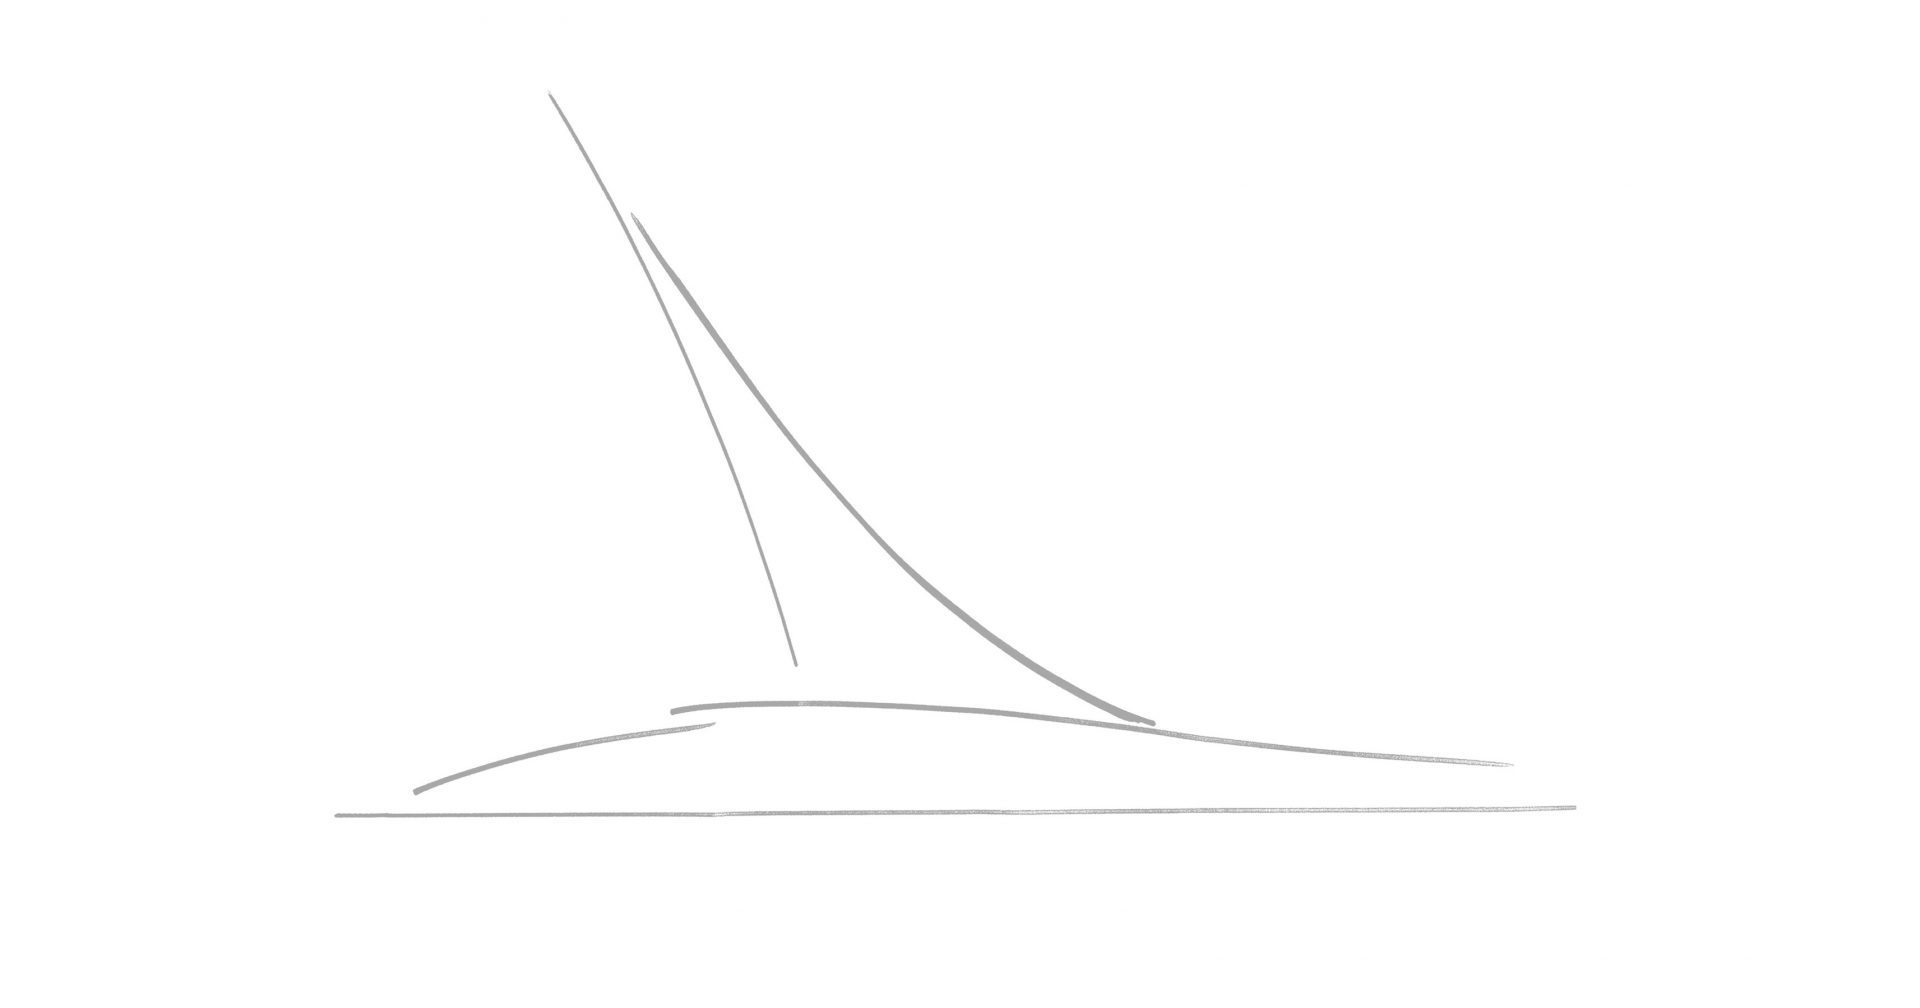 Sailing yacht design - philippe briand